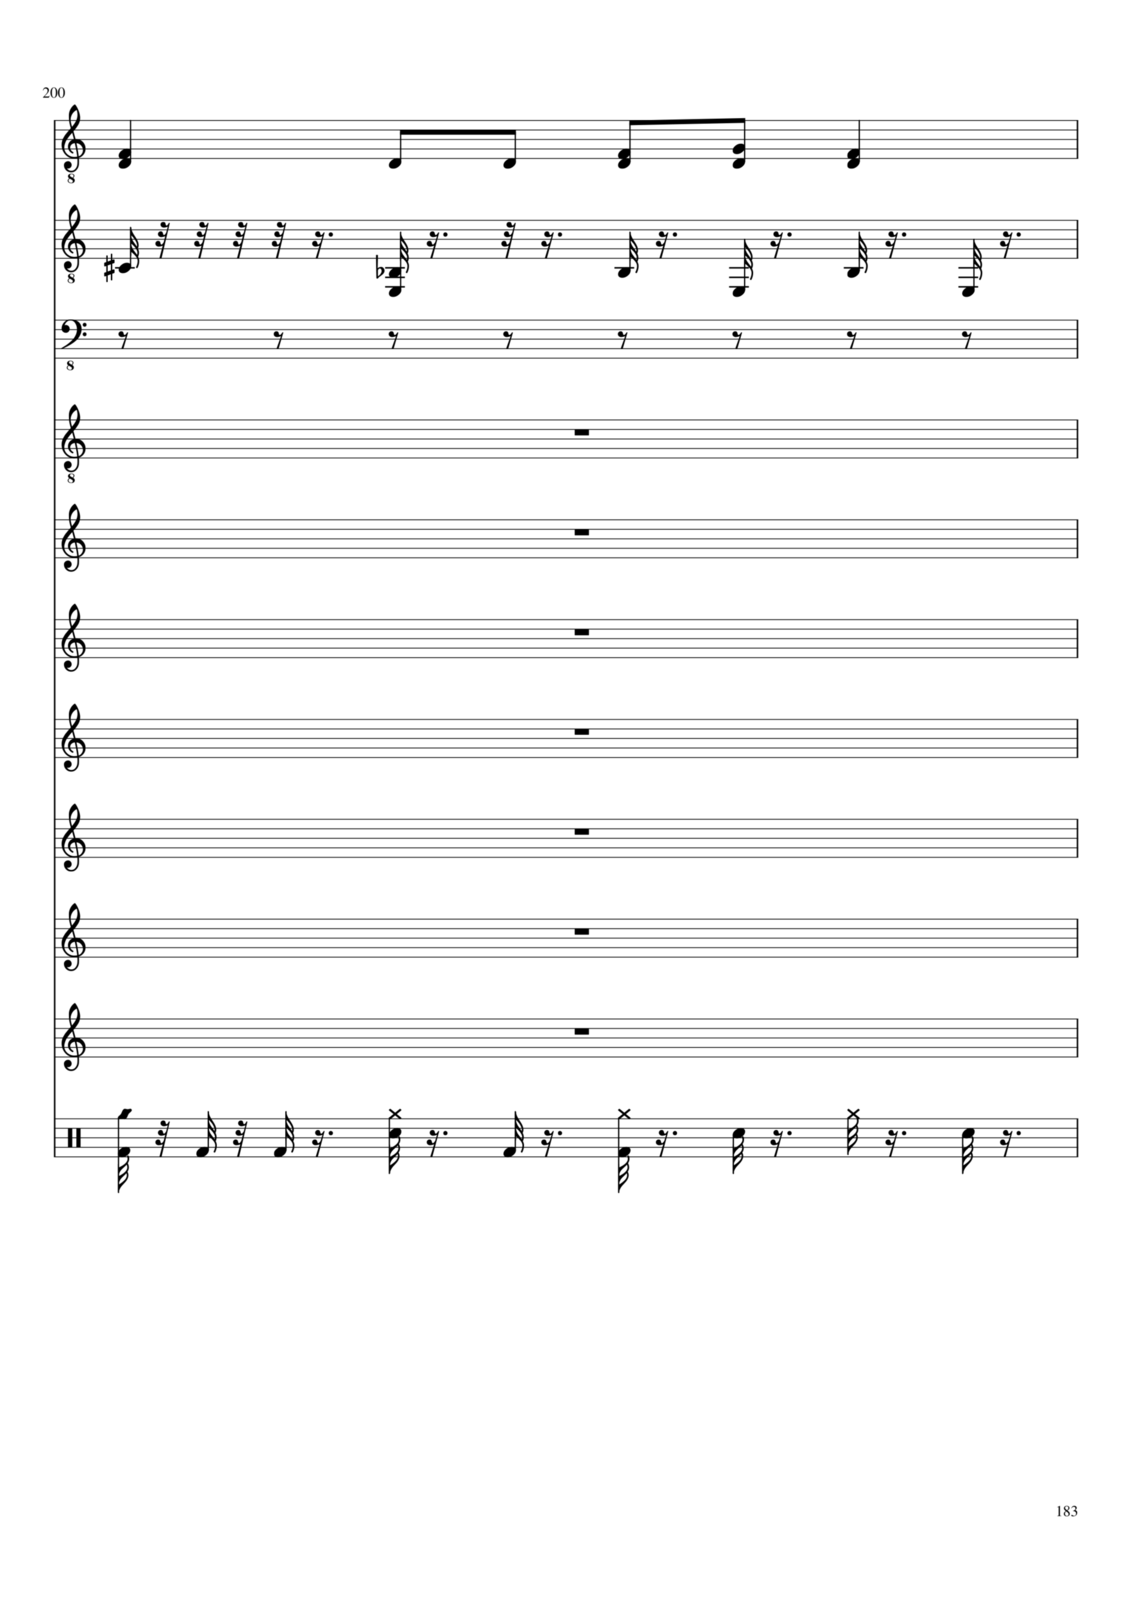 Belyiy sokol slide, Image 183